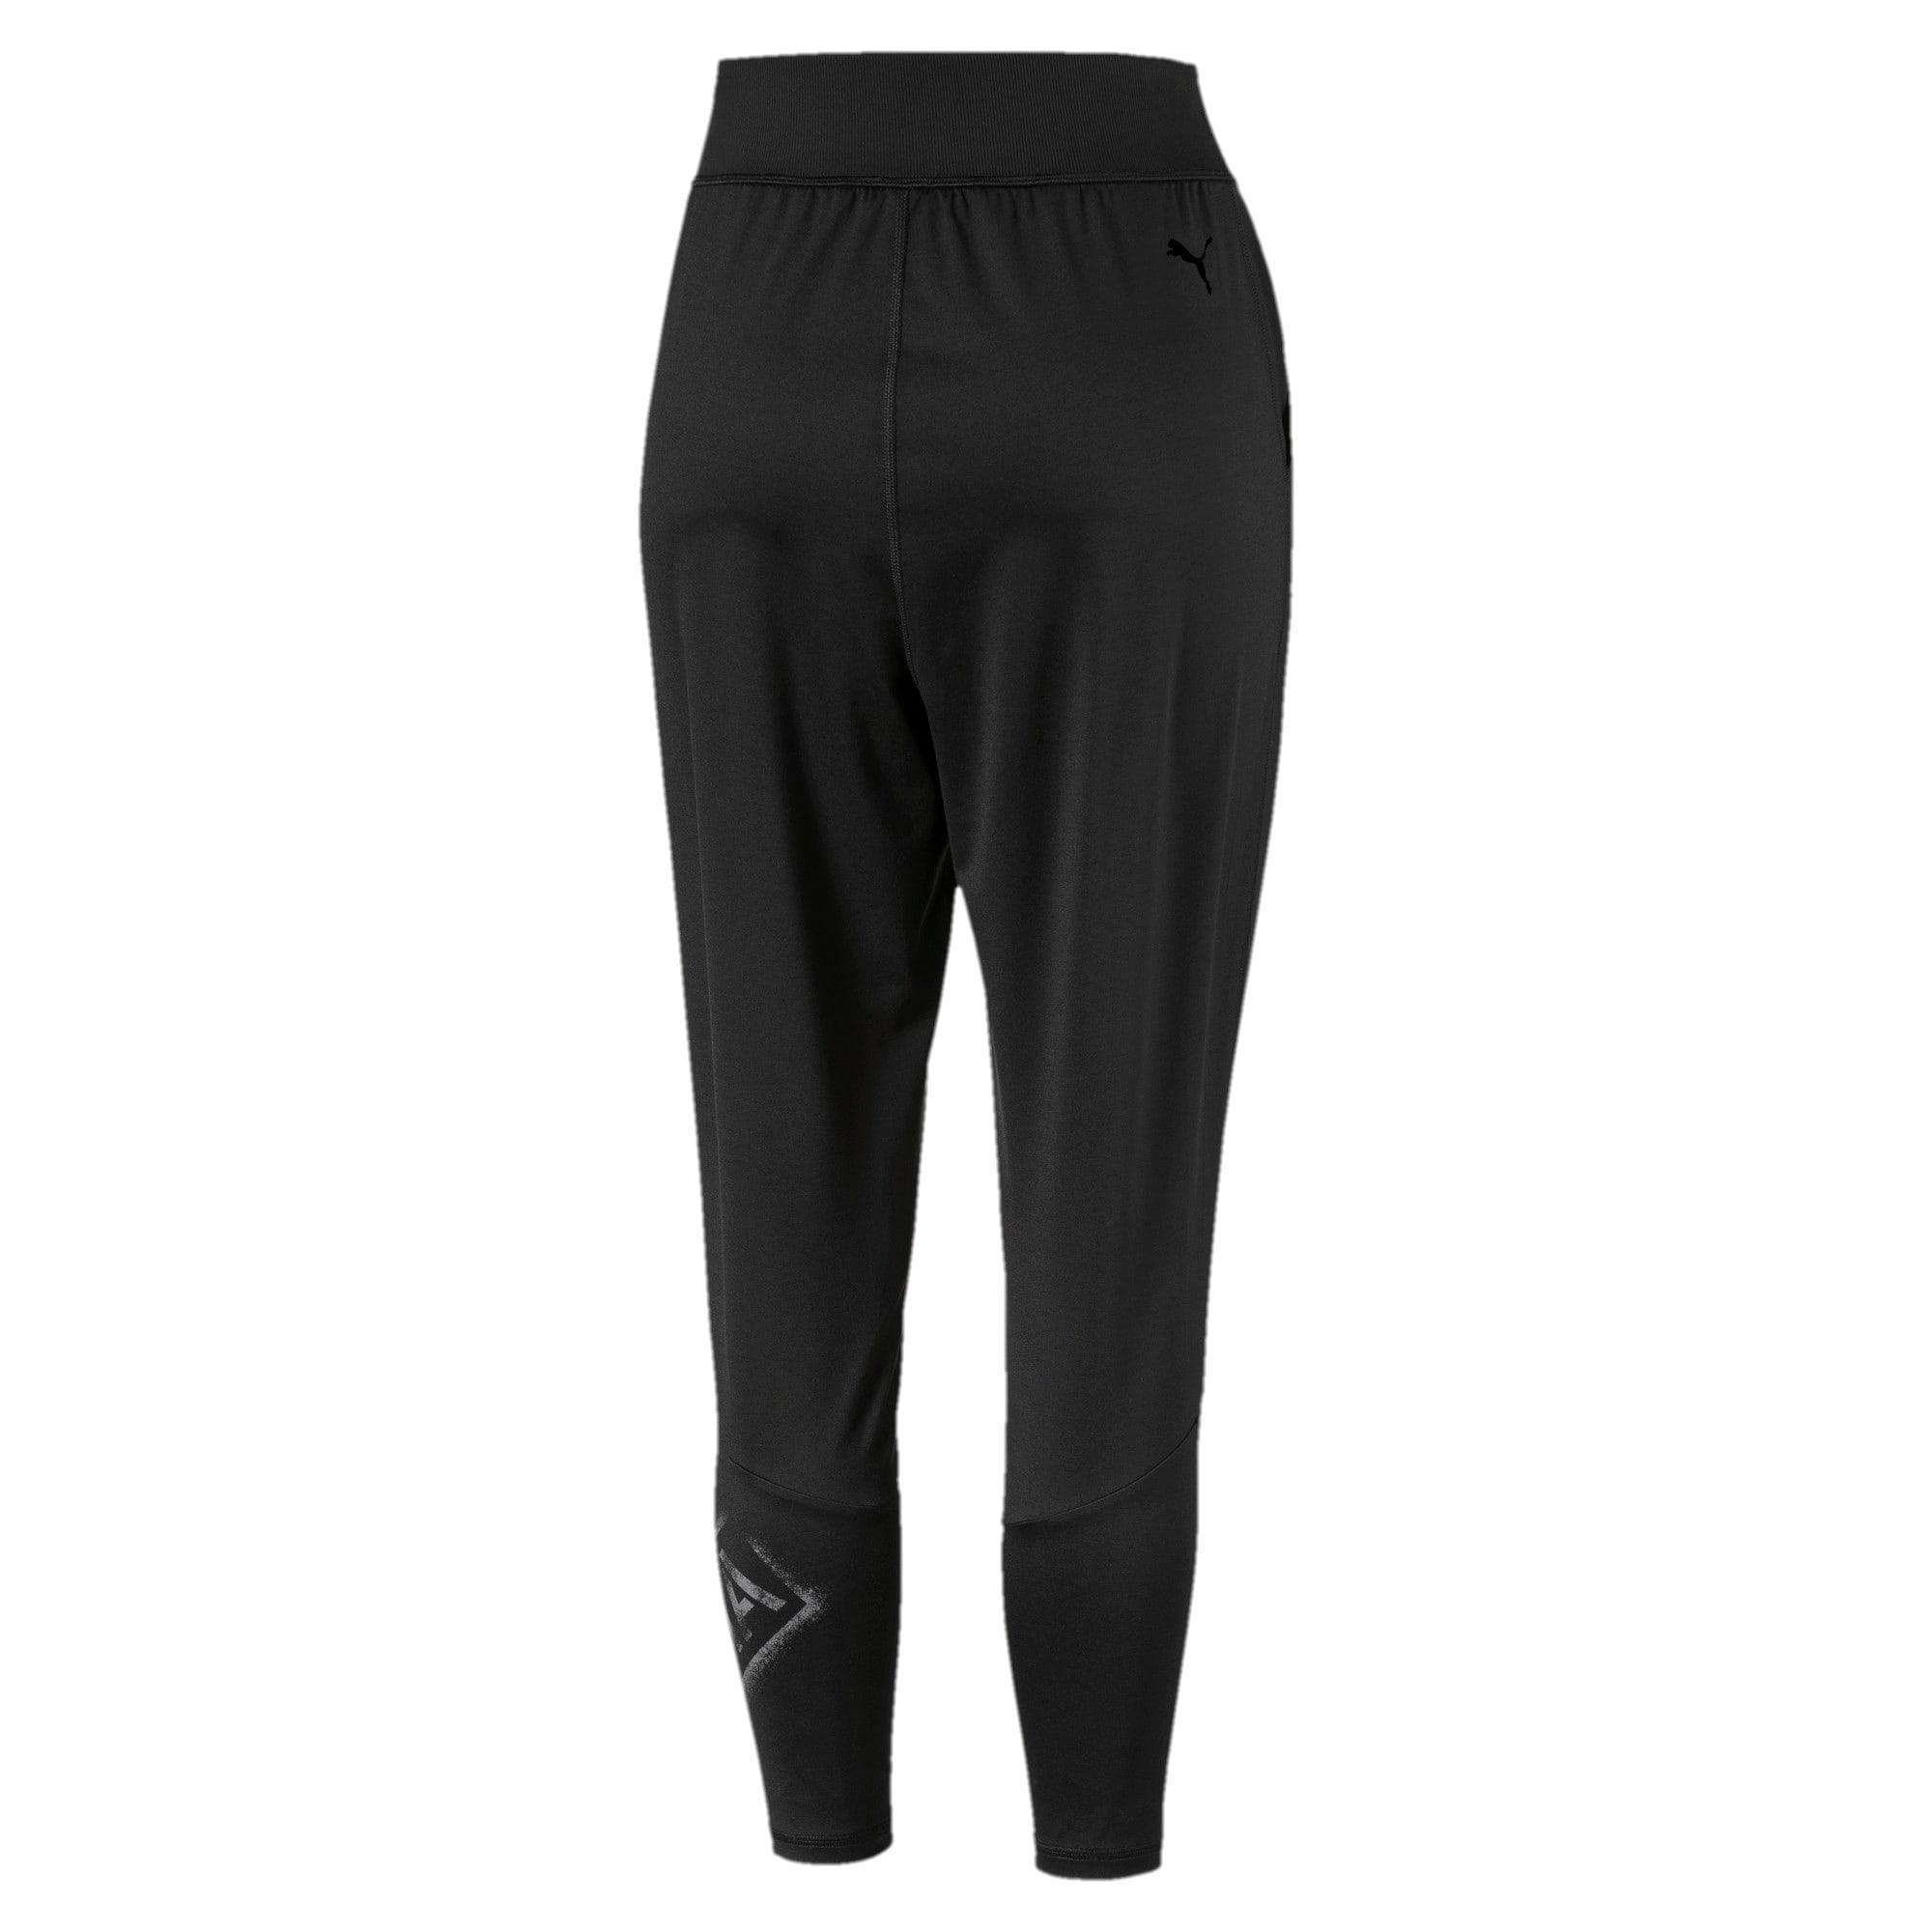 Thumbnail 5 of Studio 7/8 Knitted Women's Sweatpants, Puma Black, medium-IND